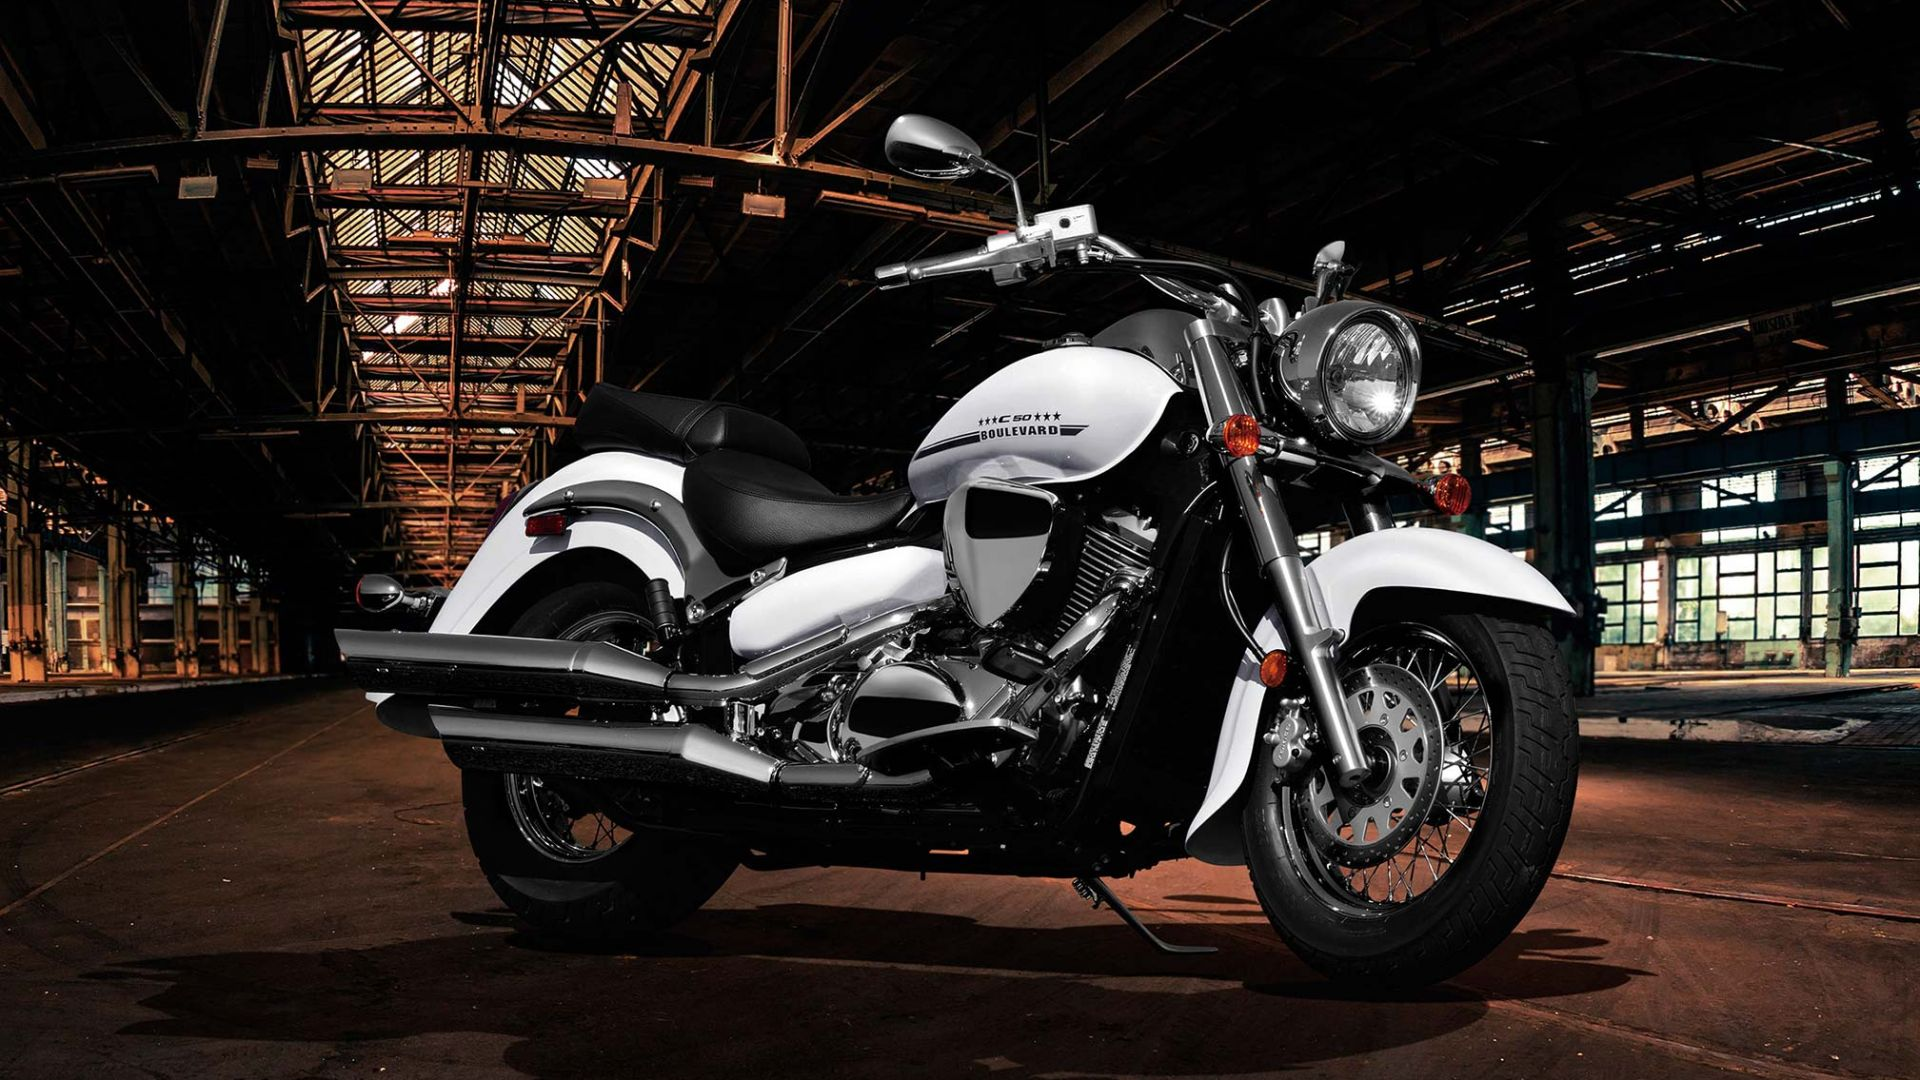 Wallpaper 2017 Suzuki Boulevard C50, motorcycle